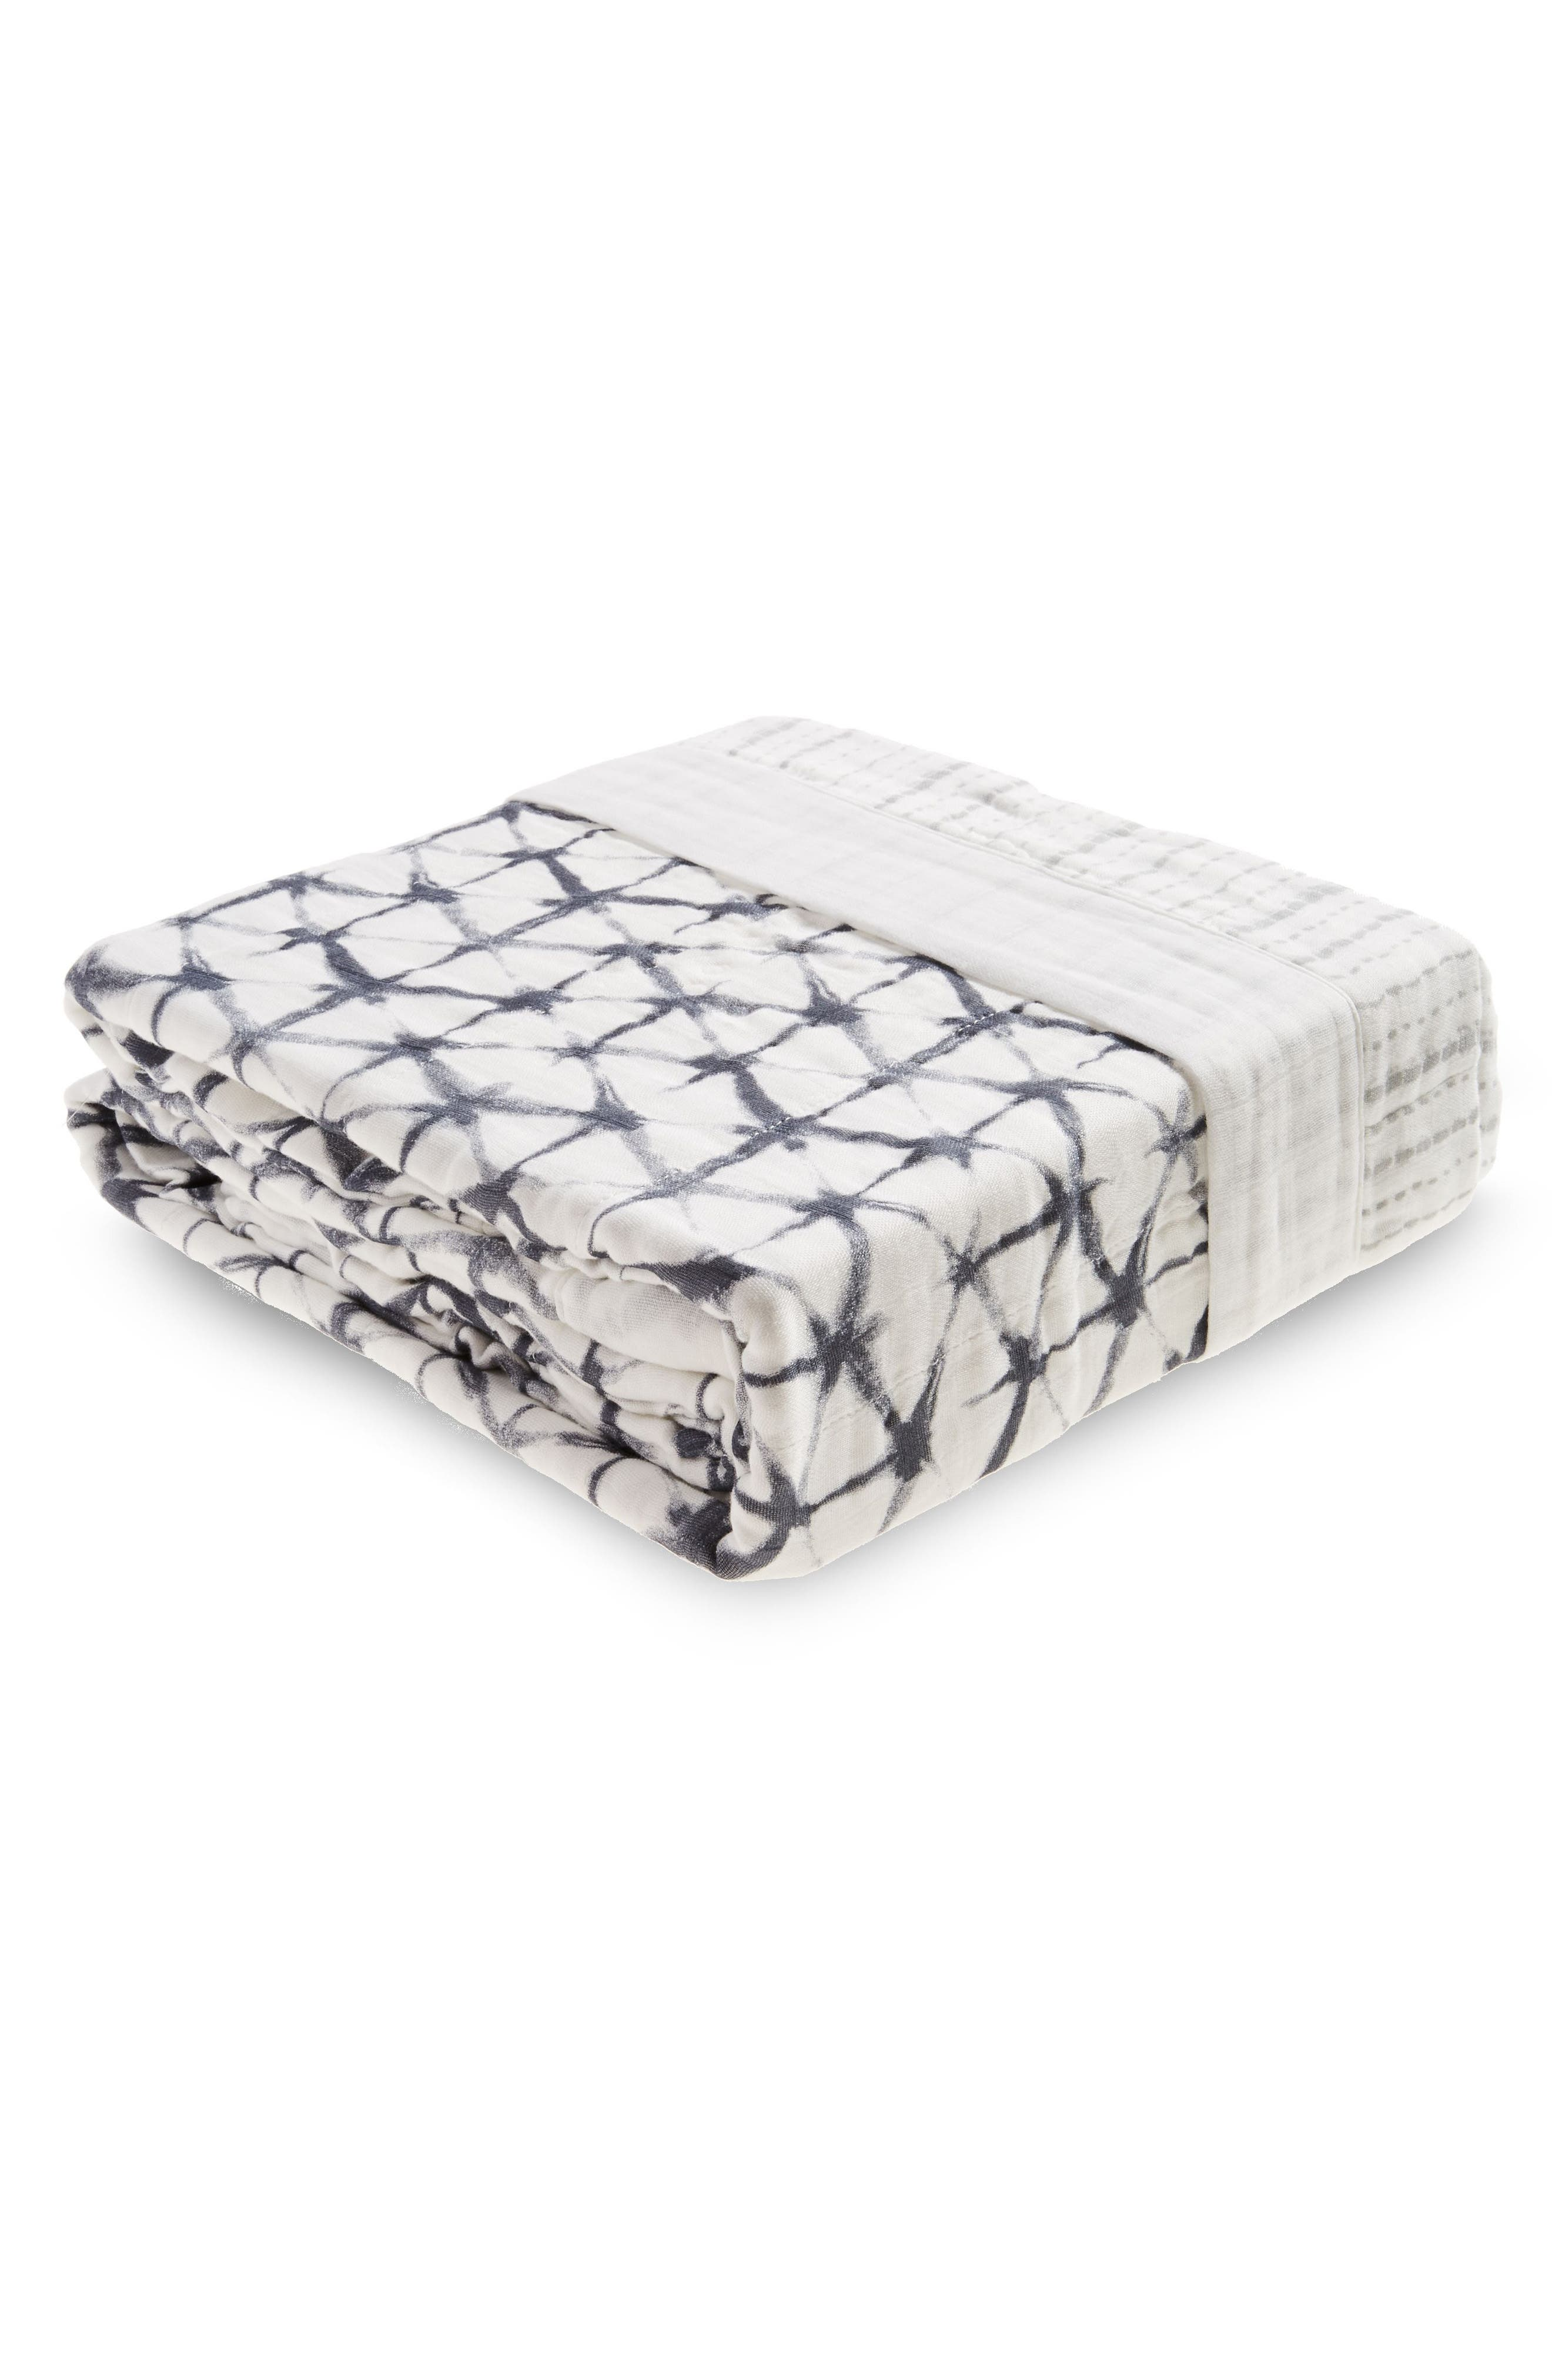 Oversize Muslin Blanket,                             Main thumbnail 1, color,                             Pebble Shibori